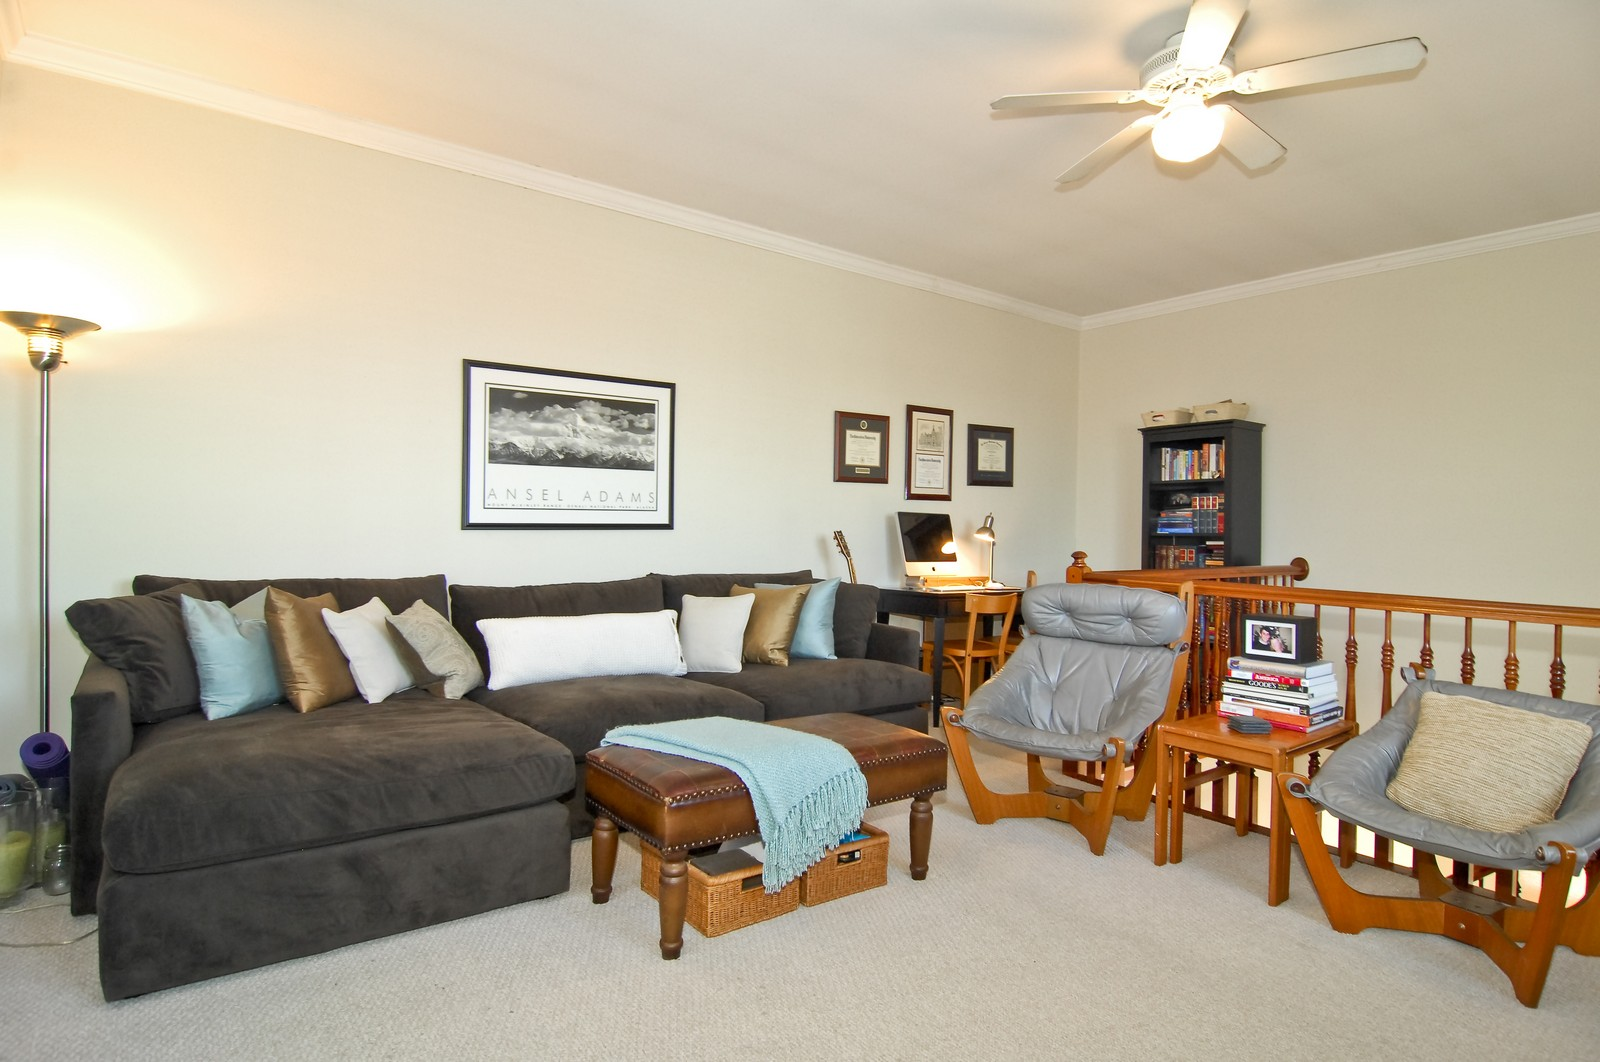 Real Estate Photography - 1865 N Winnebago, Unit 4, Chicago, IL, 60647 - Location 4